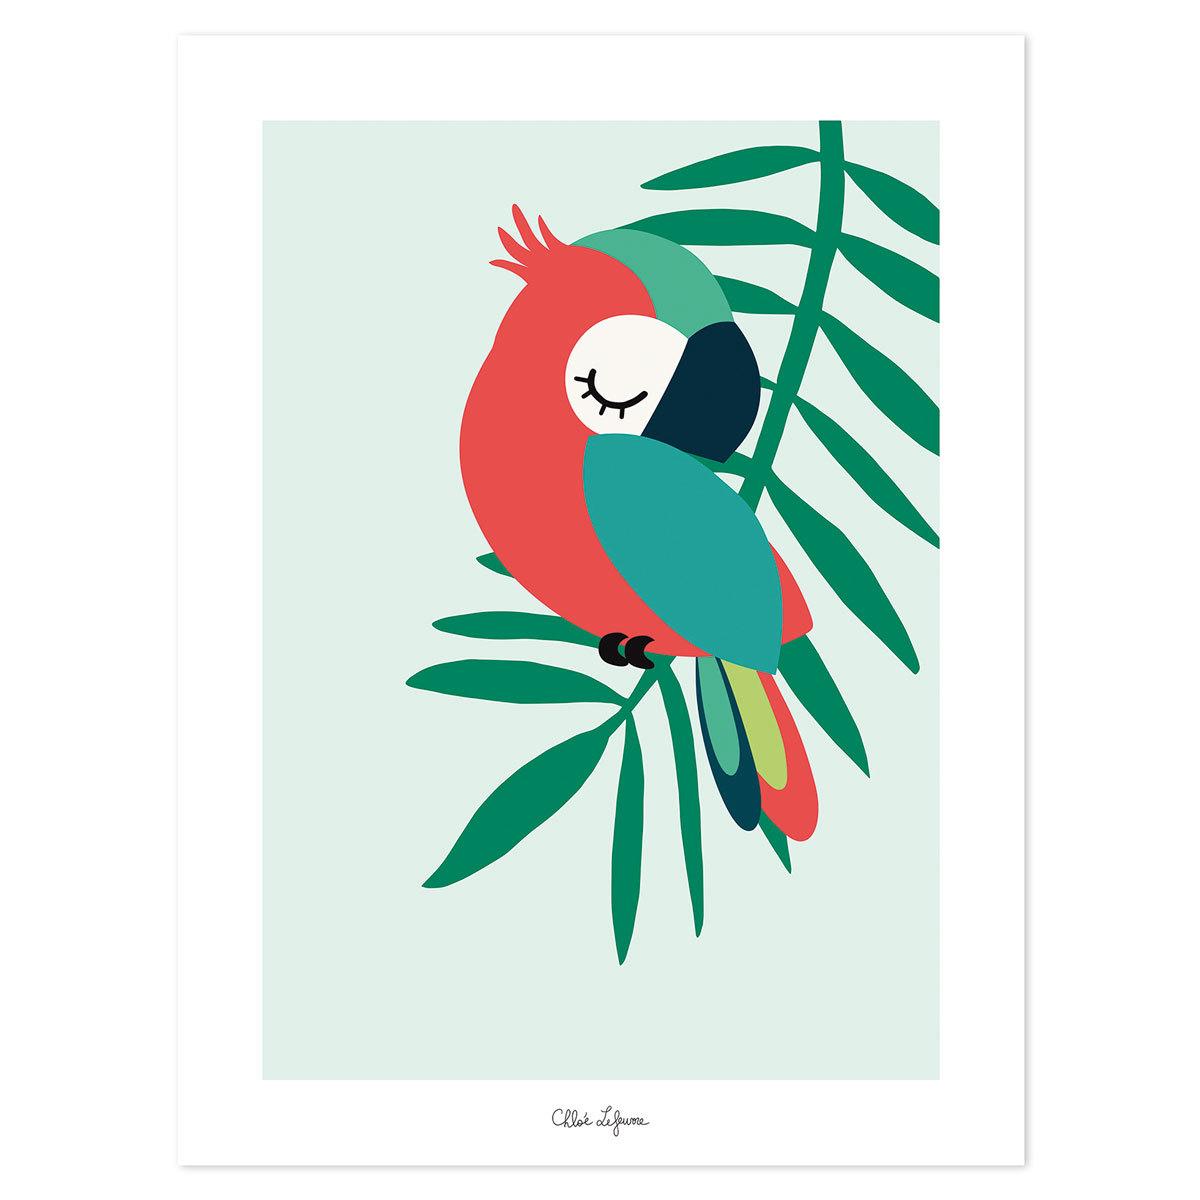 Affiche & poster Tropica - Affiche Perroquet Vert Tropica - Affiche Perroquet Vert